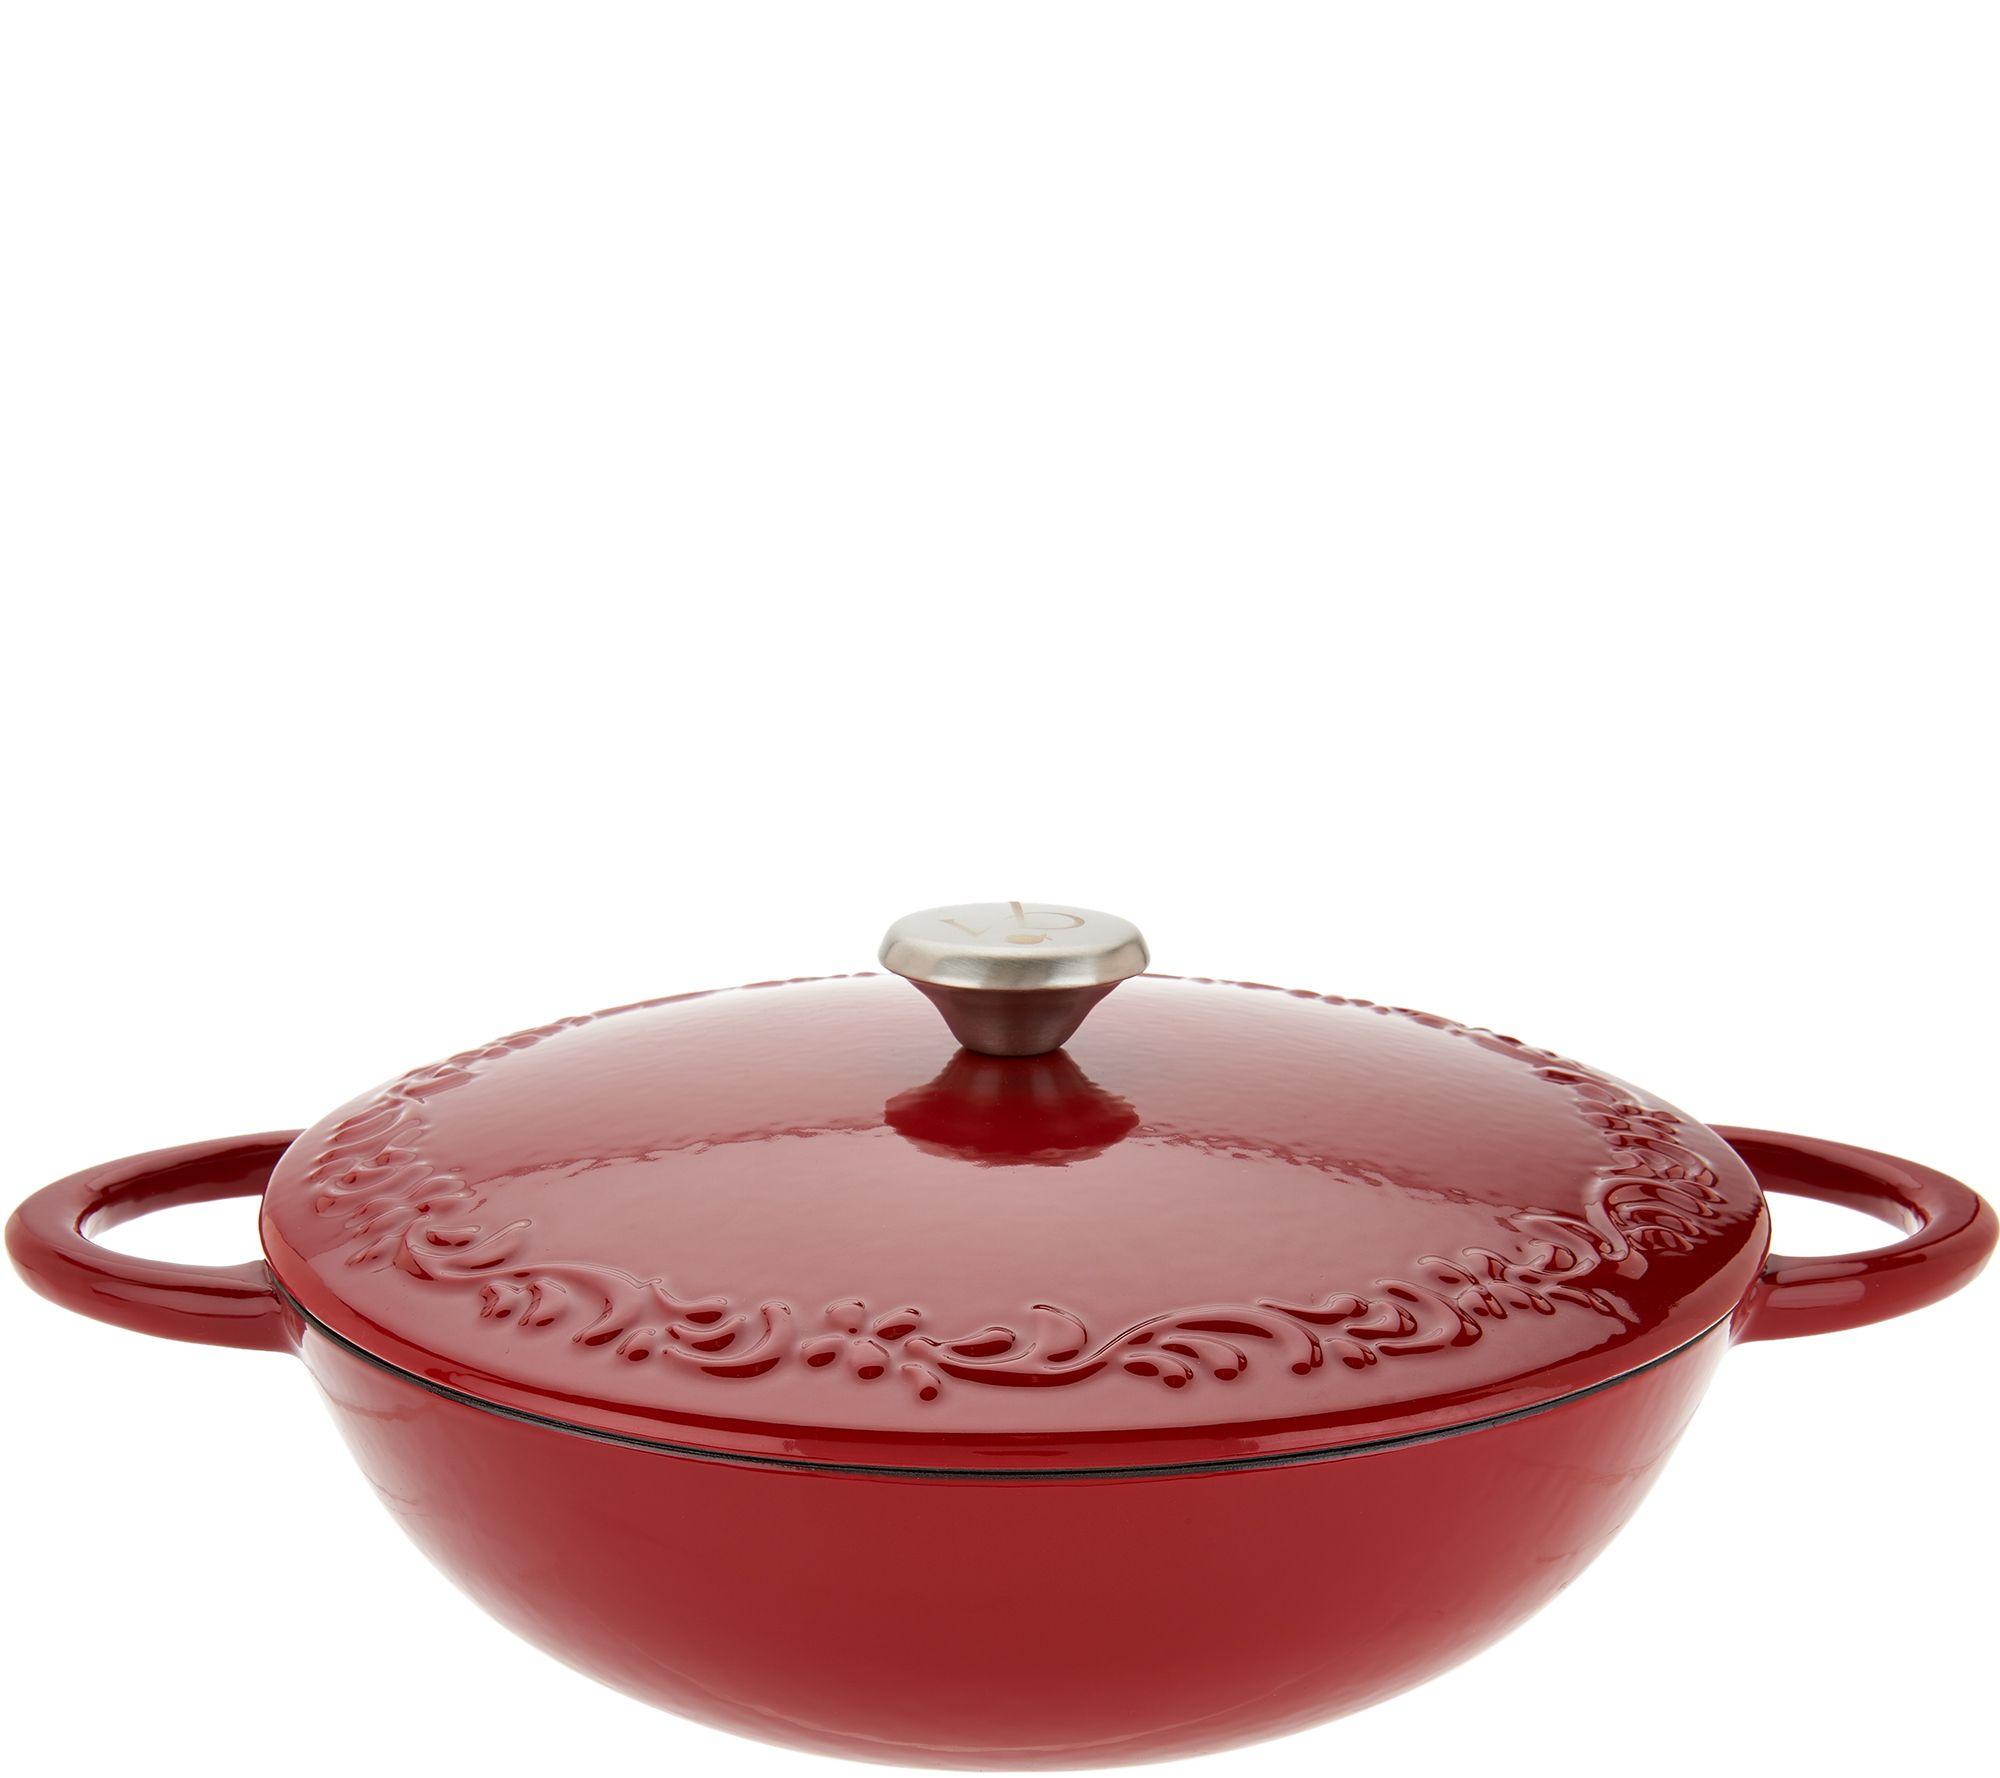 Valerie Bertinelli Cookware